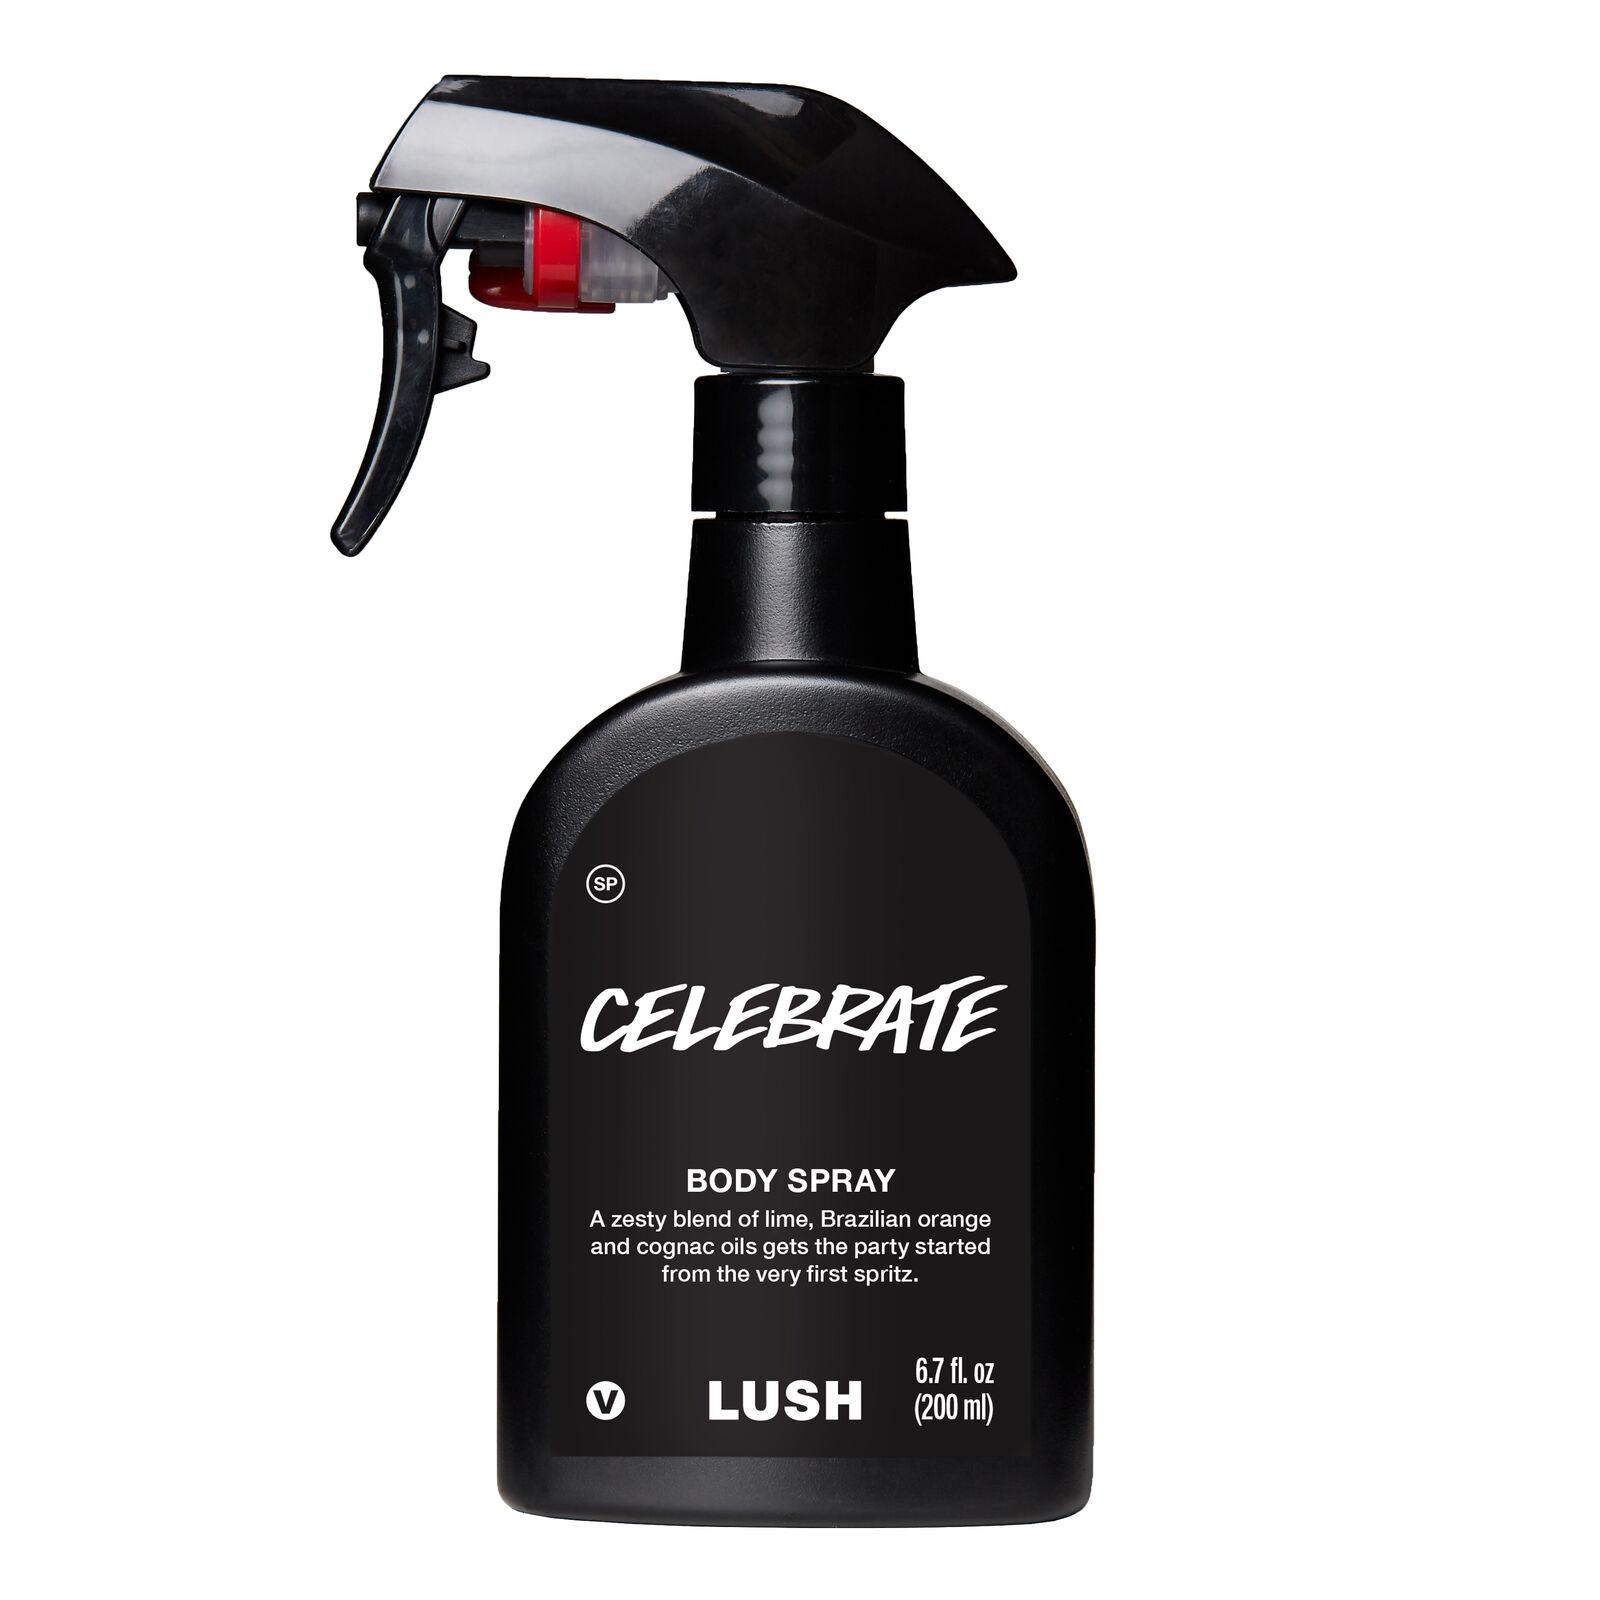 Lush Black Friday Perfume